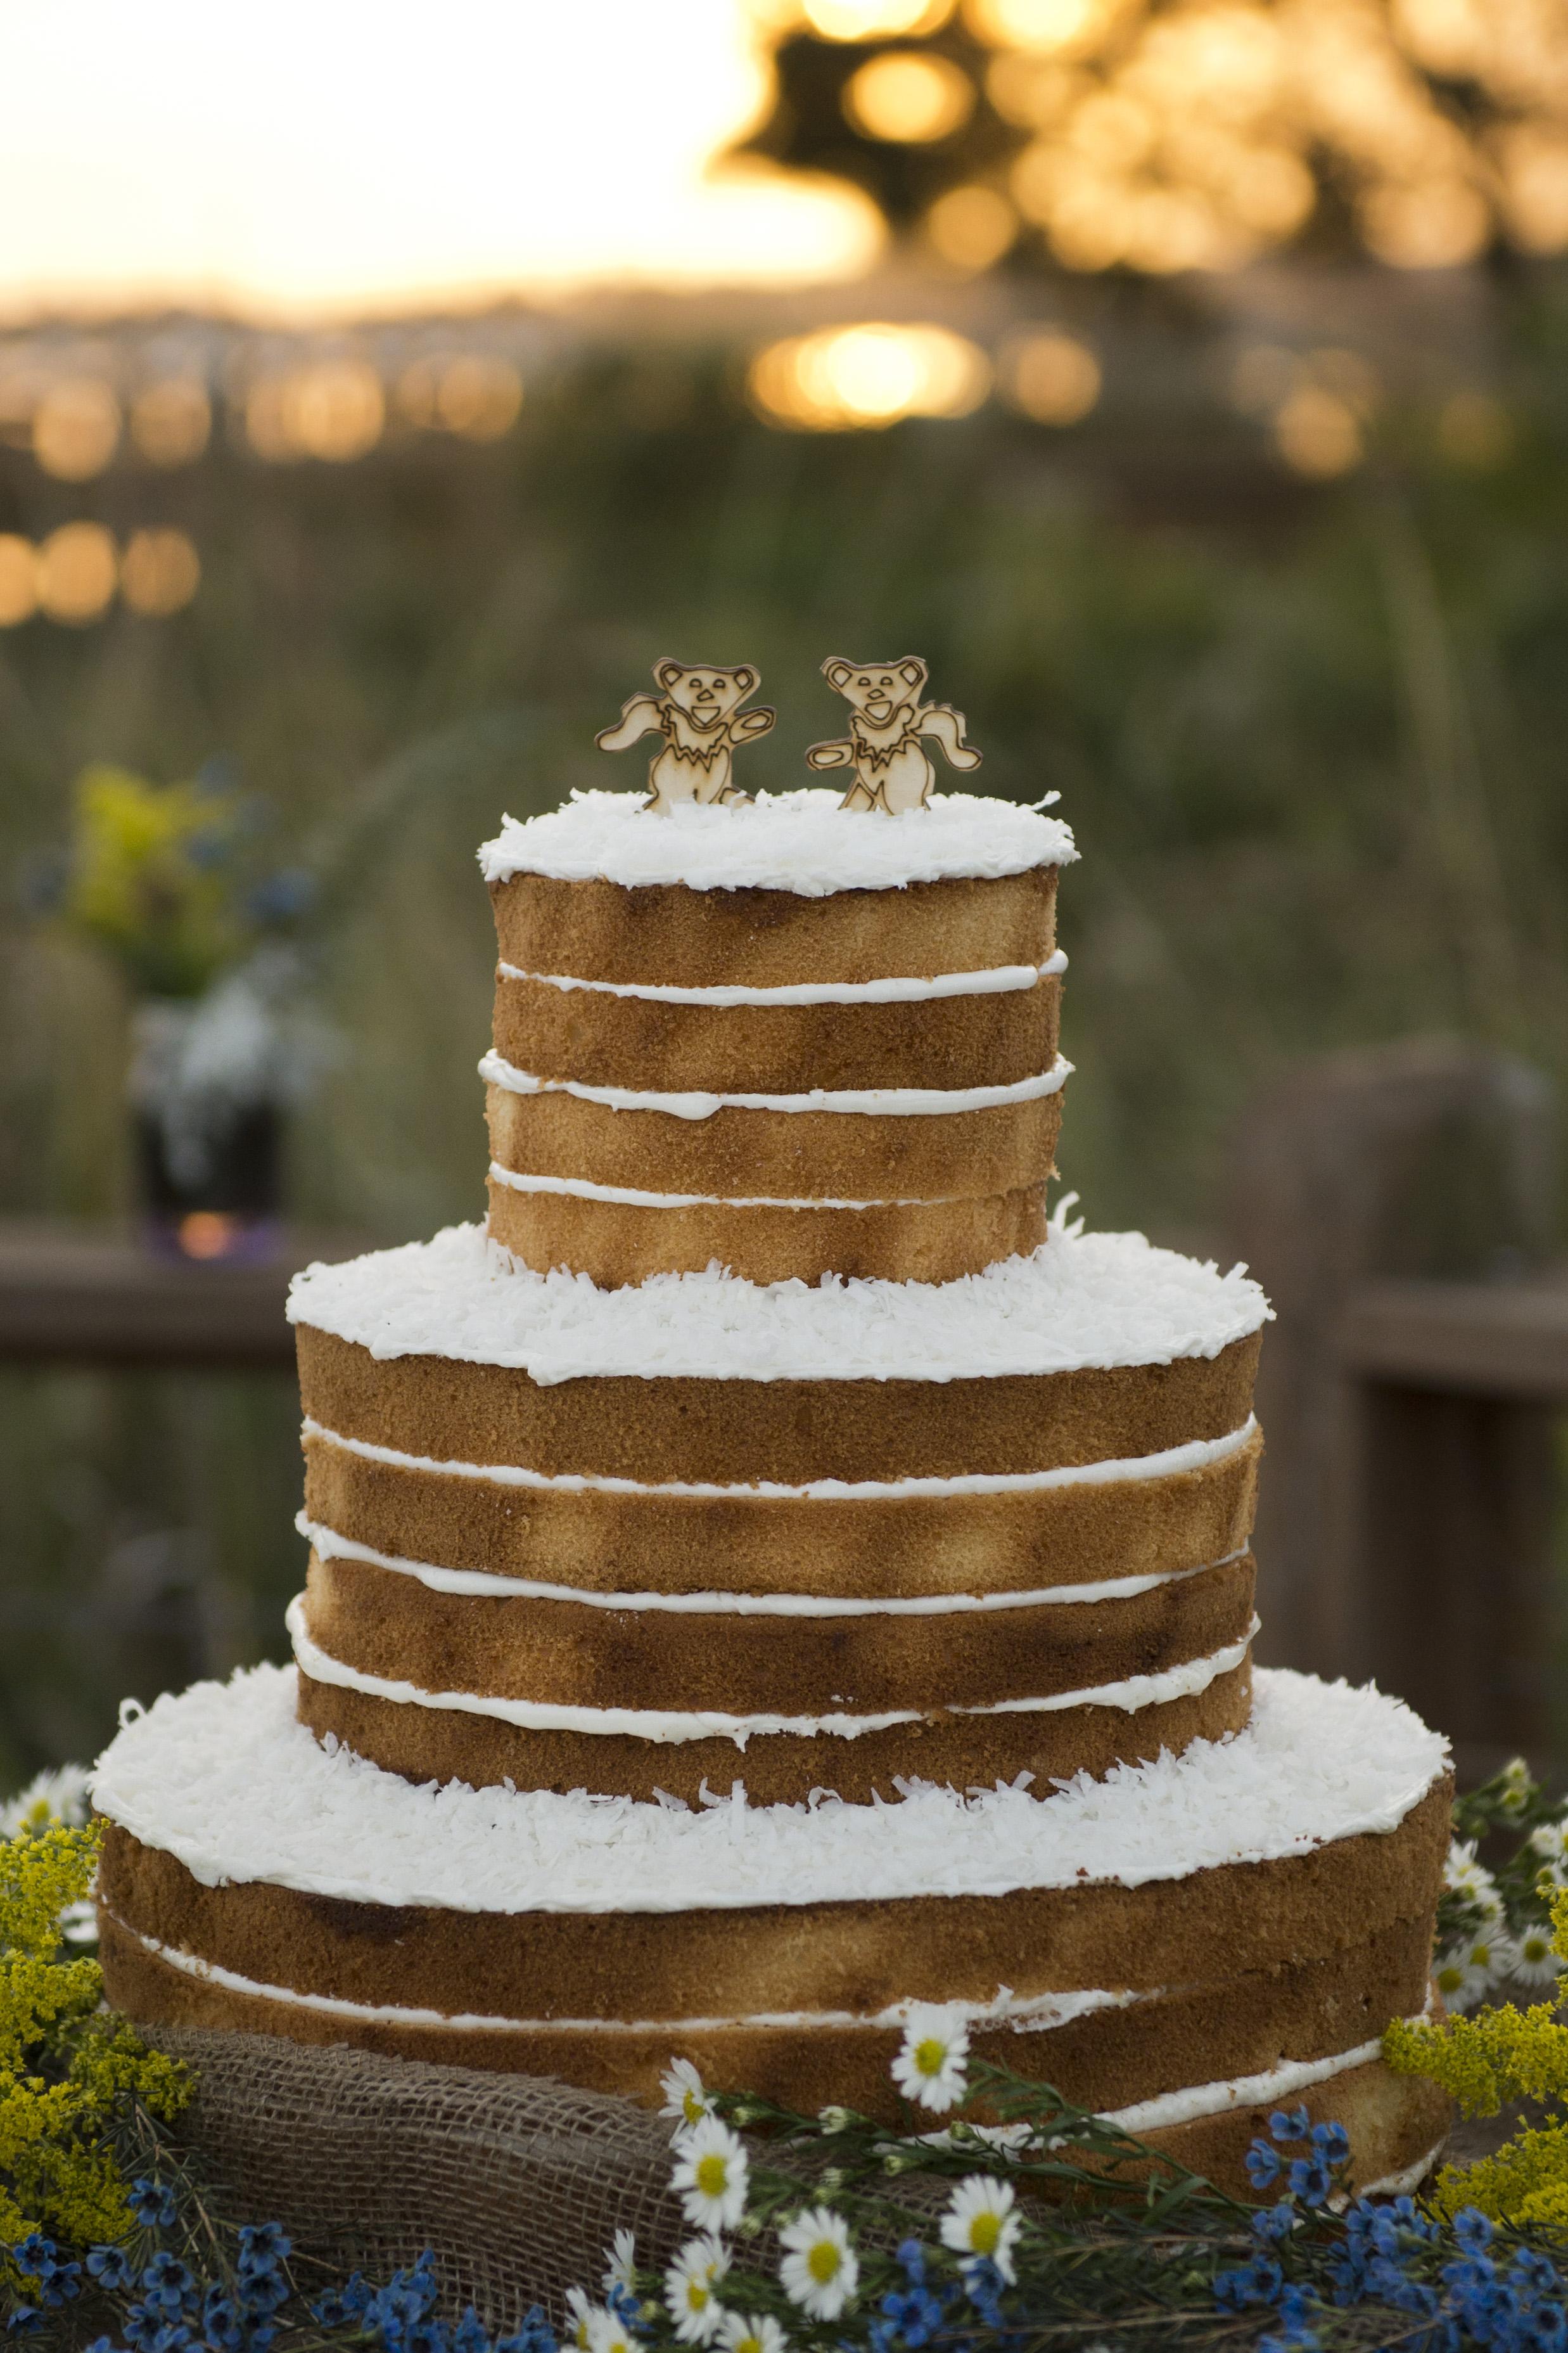 Caroline-Kilgore-photography-ivory-and-beau-bridal-boutique-savannah-wedding-dresses-savannah-bridal-boutique-savannah-wedding-gowns-custom-wedding-dress-vintage-wedding-dress-swiss-dot-wedding-dress-shrimp-boat-wedding-13.jpg